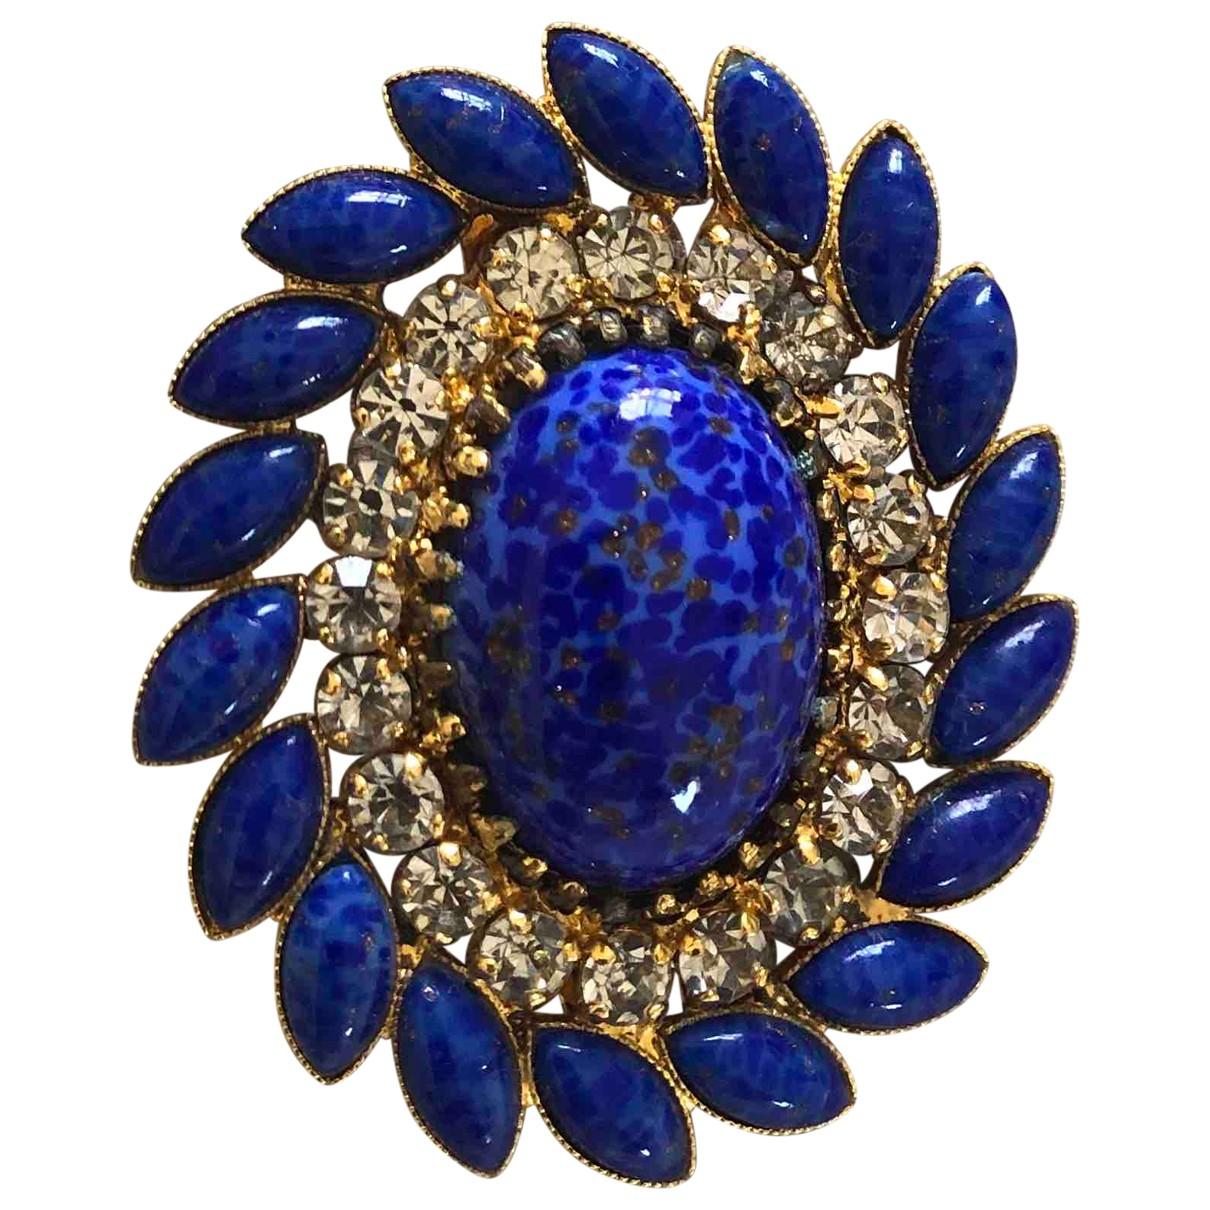 Broche en Metal Azul Non Signe / Unsigned